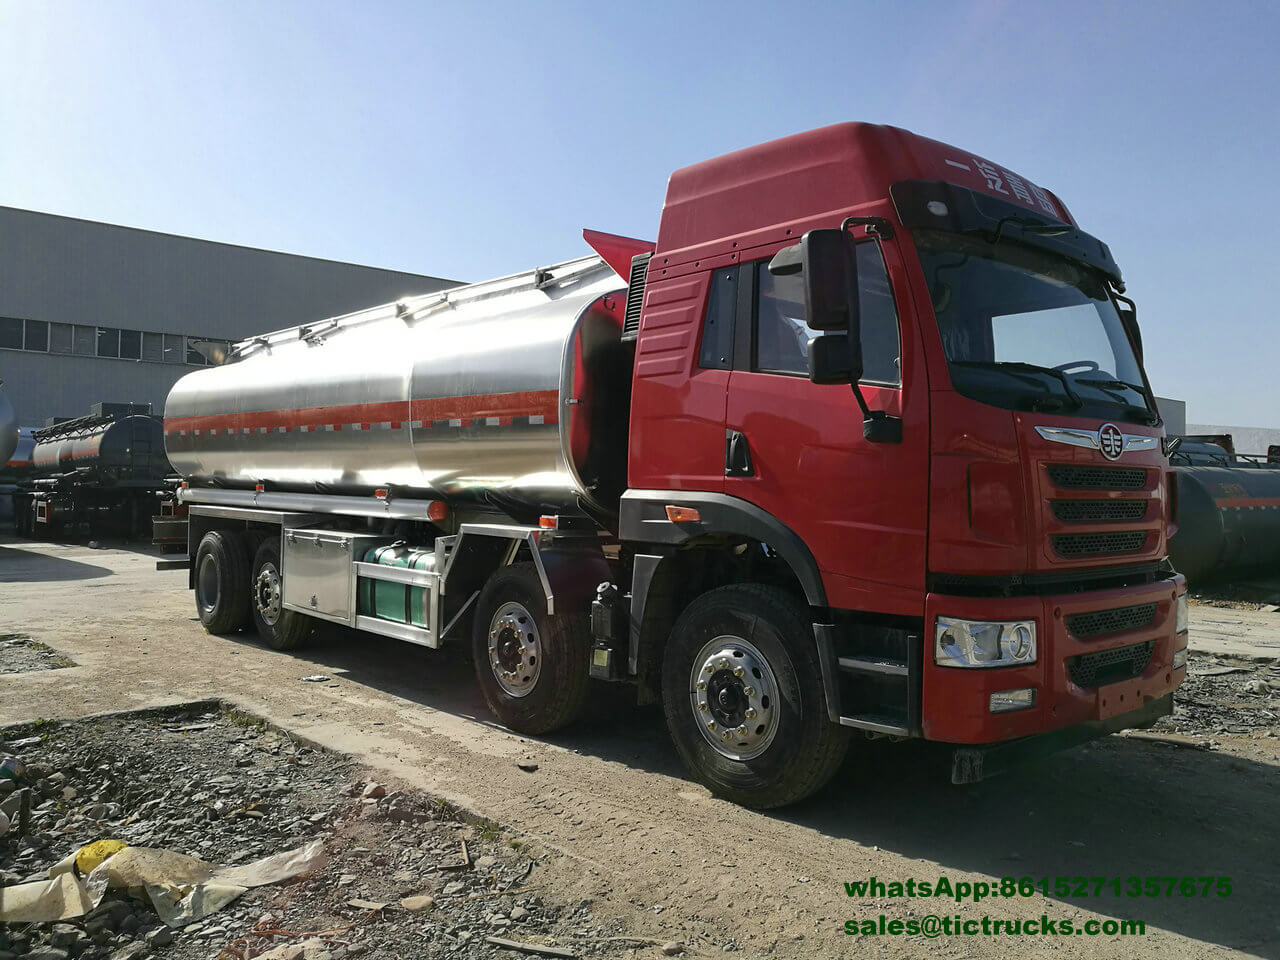 Camion-citerne -009-FAW-truck_1.jpg d'alliage d'aluminium